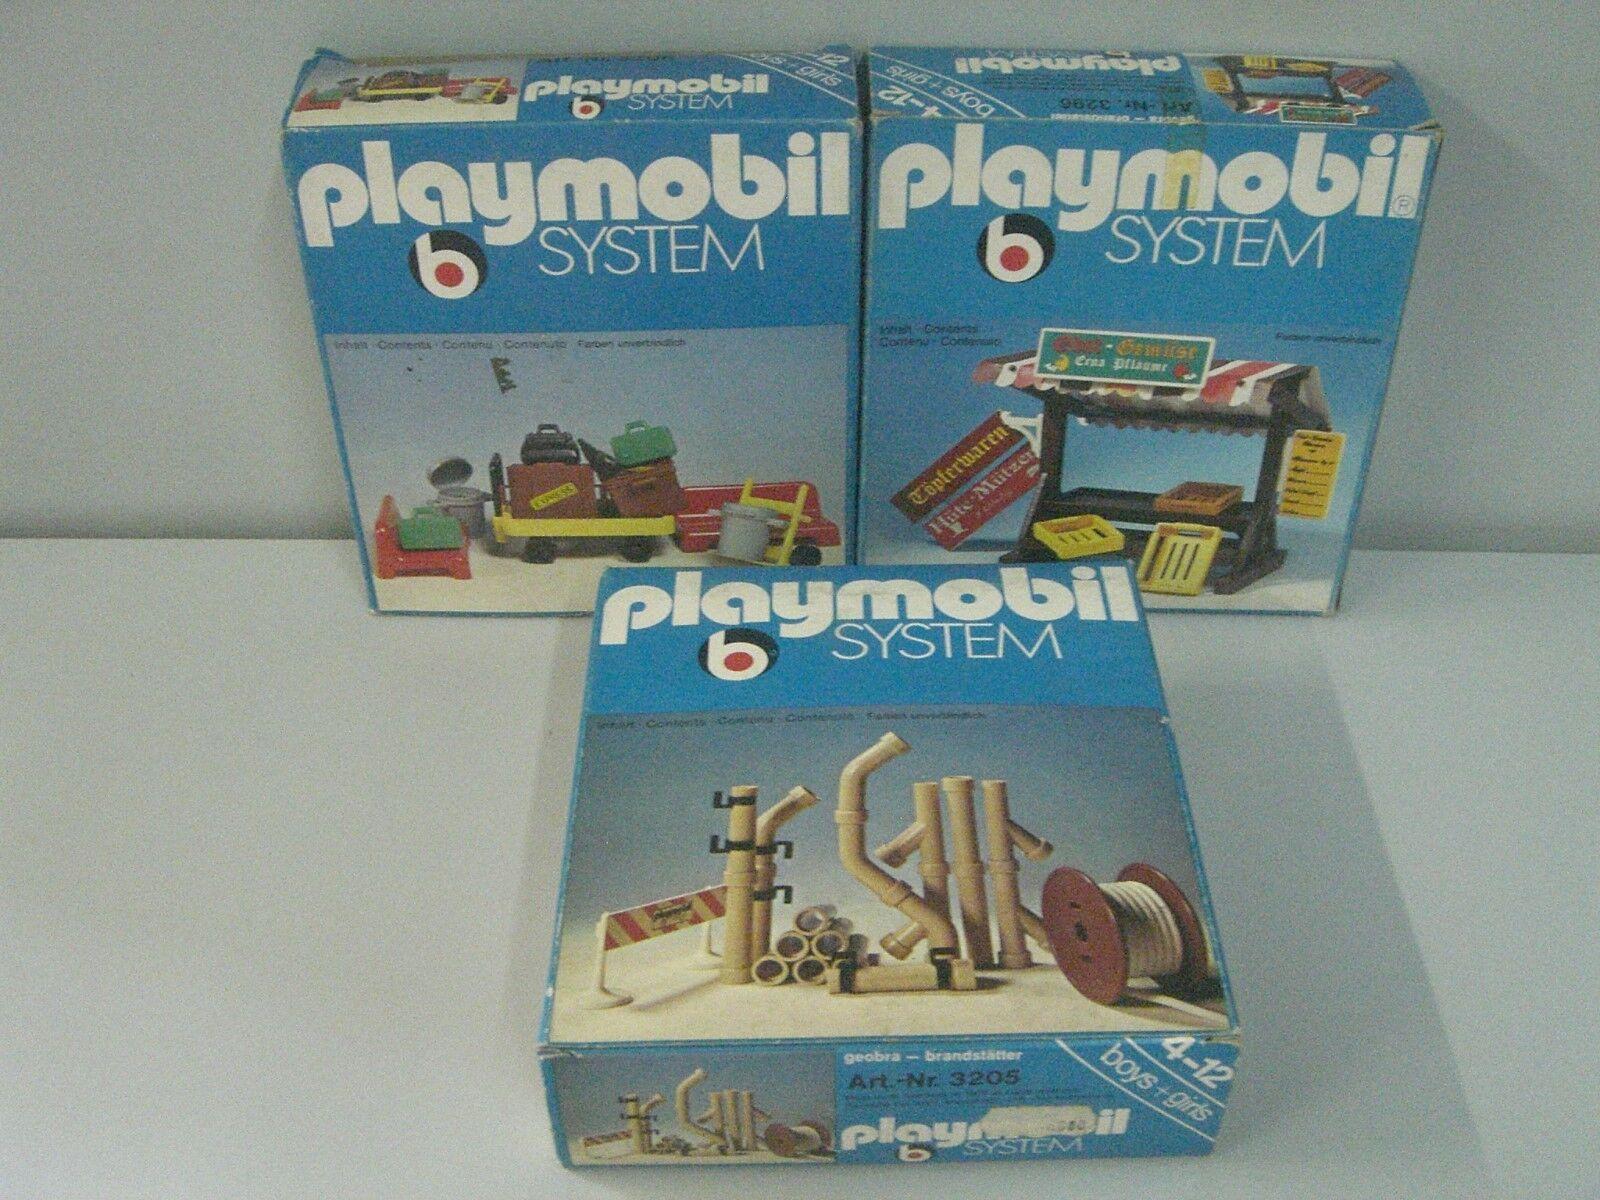 Sistema ploymobil 3 scatore 3205 - 3206 - 3296 anni '70